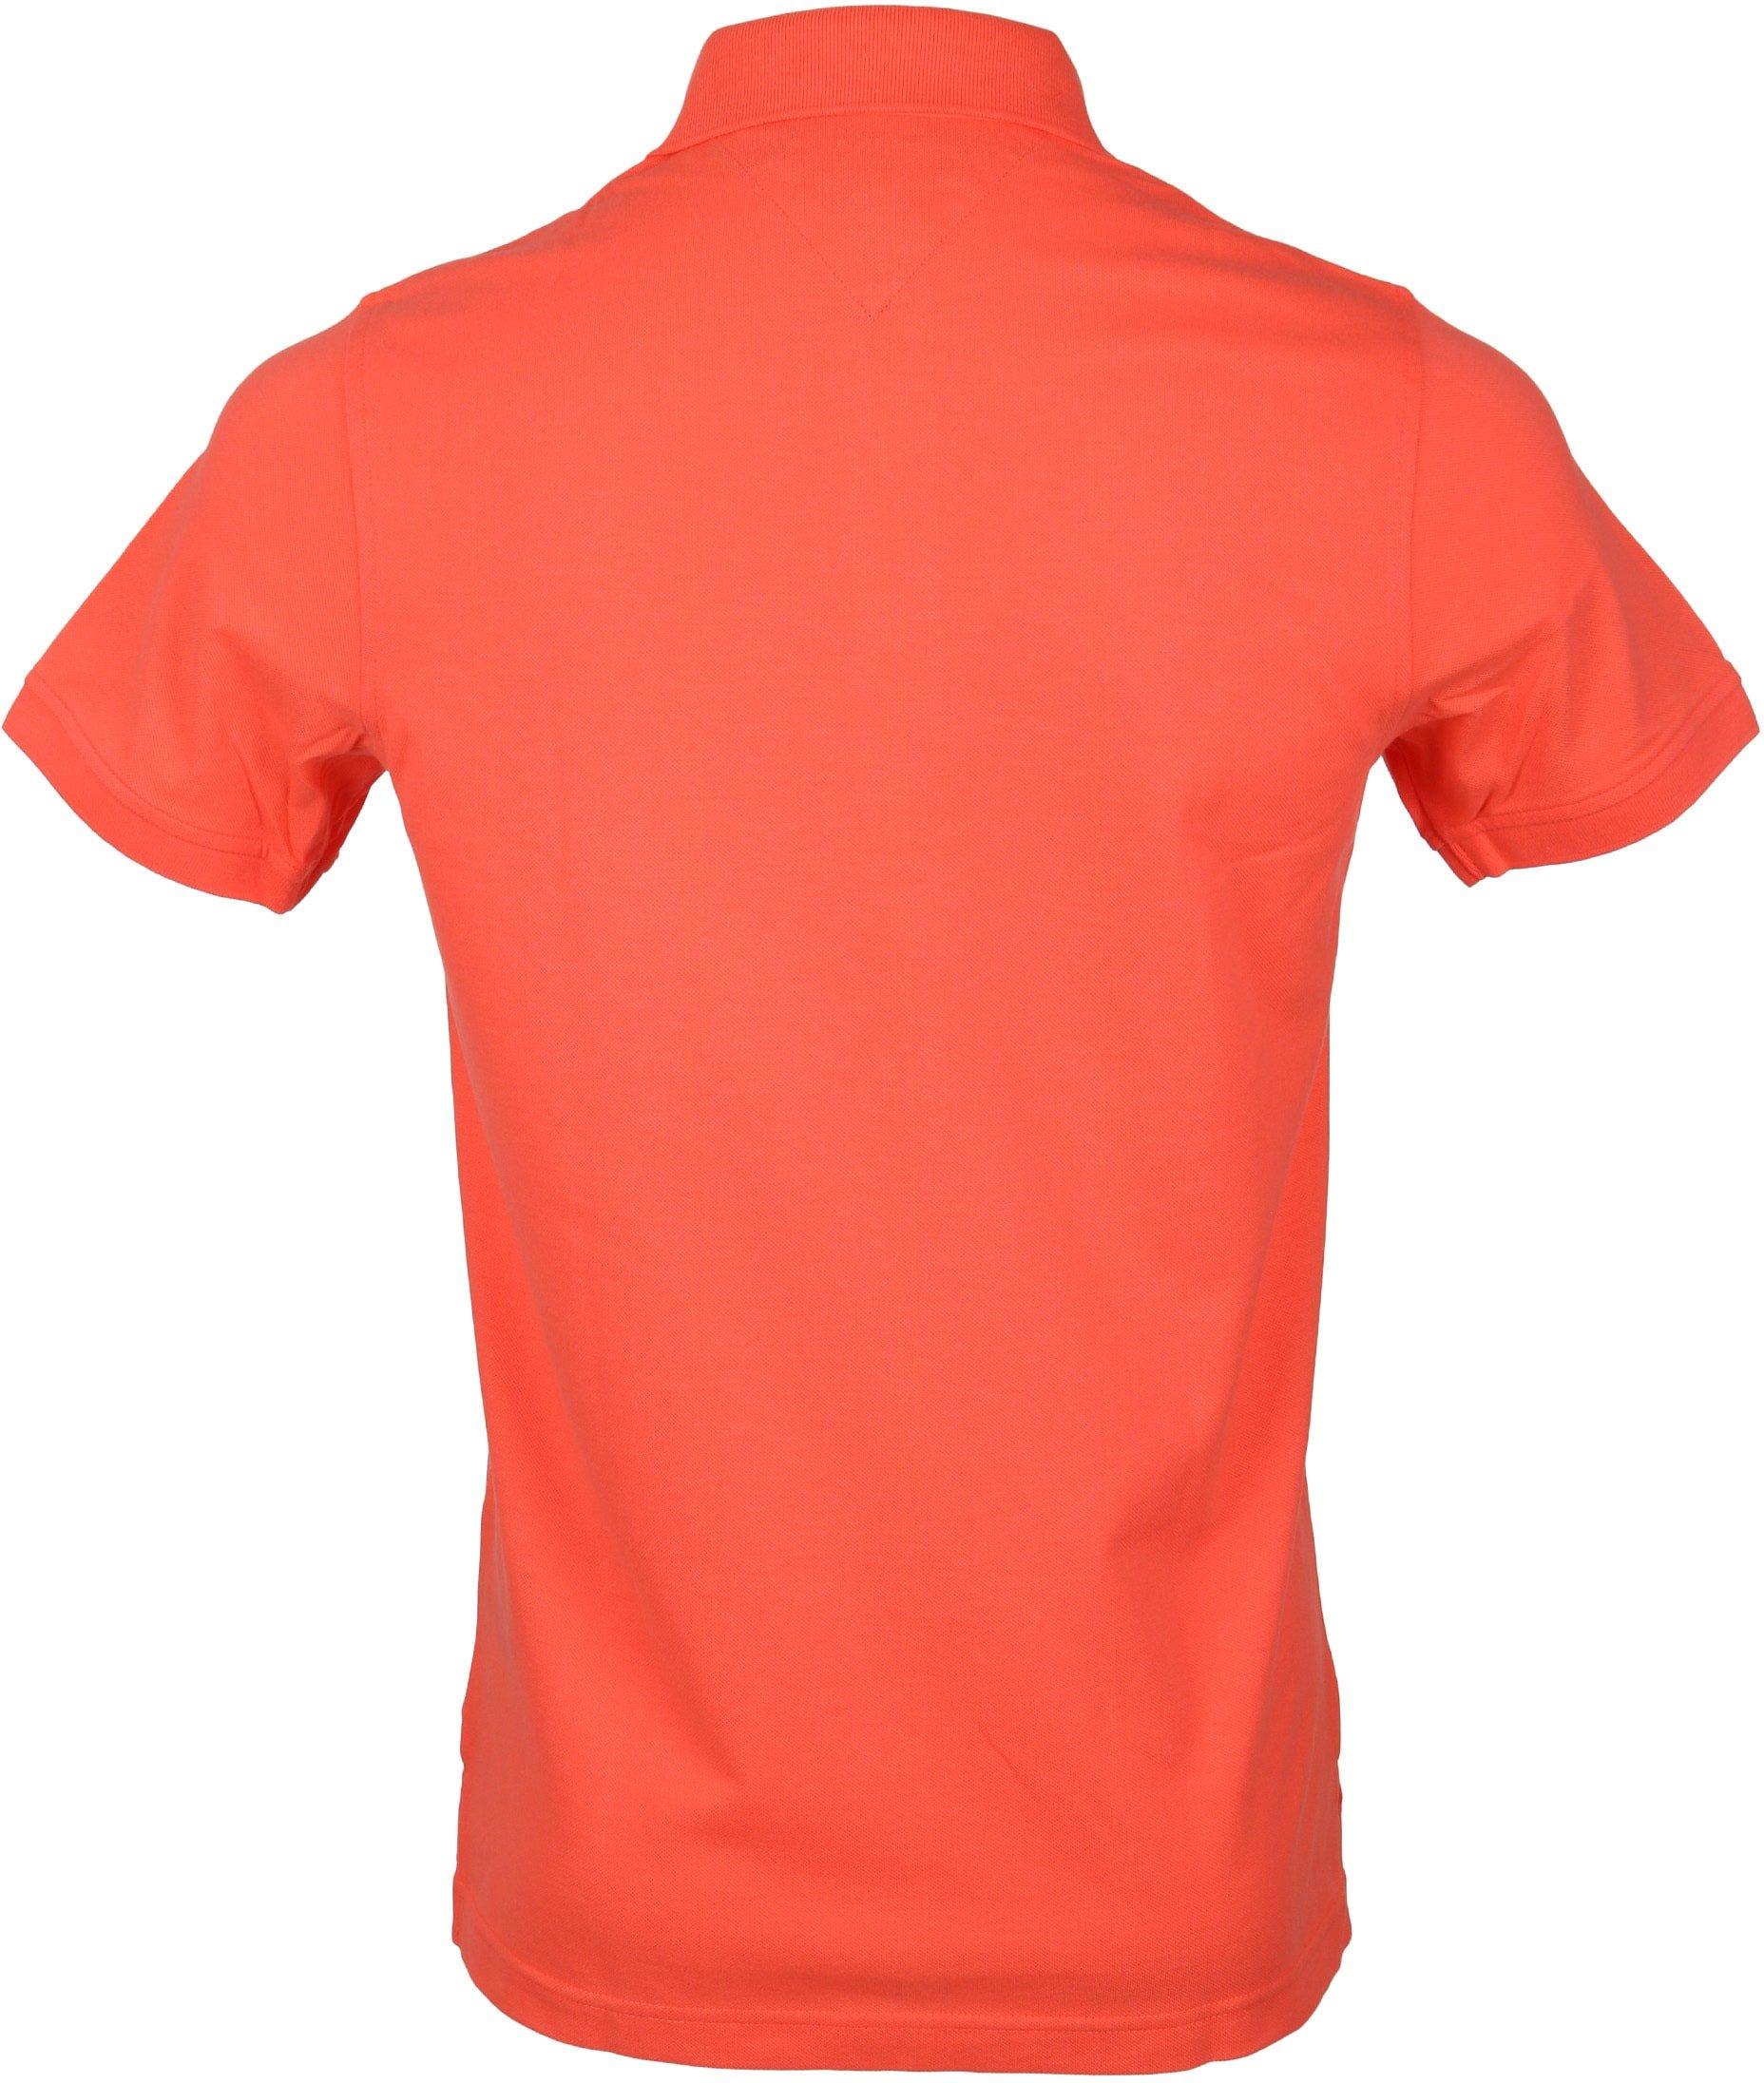 Tommy Hilfiger Polo Uni Oranje foto 2